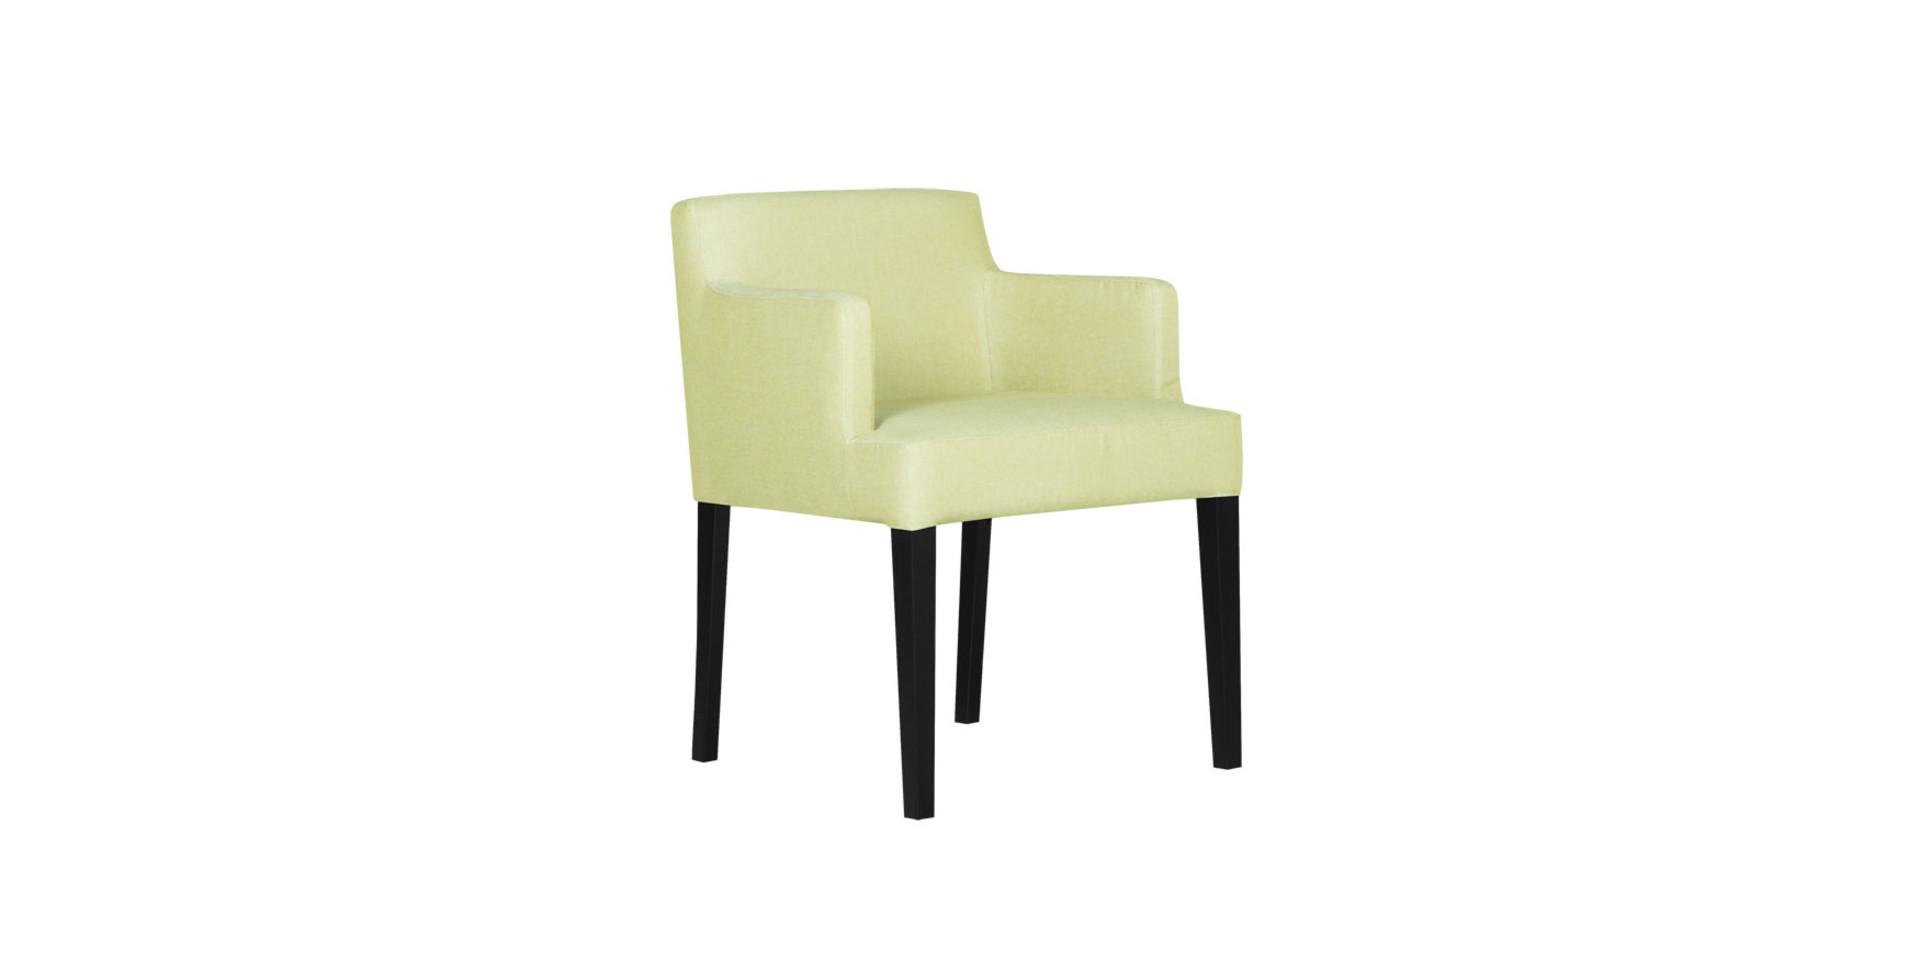 sits-linn-fauteuil-chair_lila12_green_2